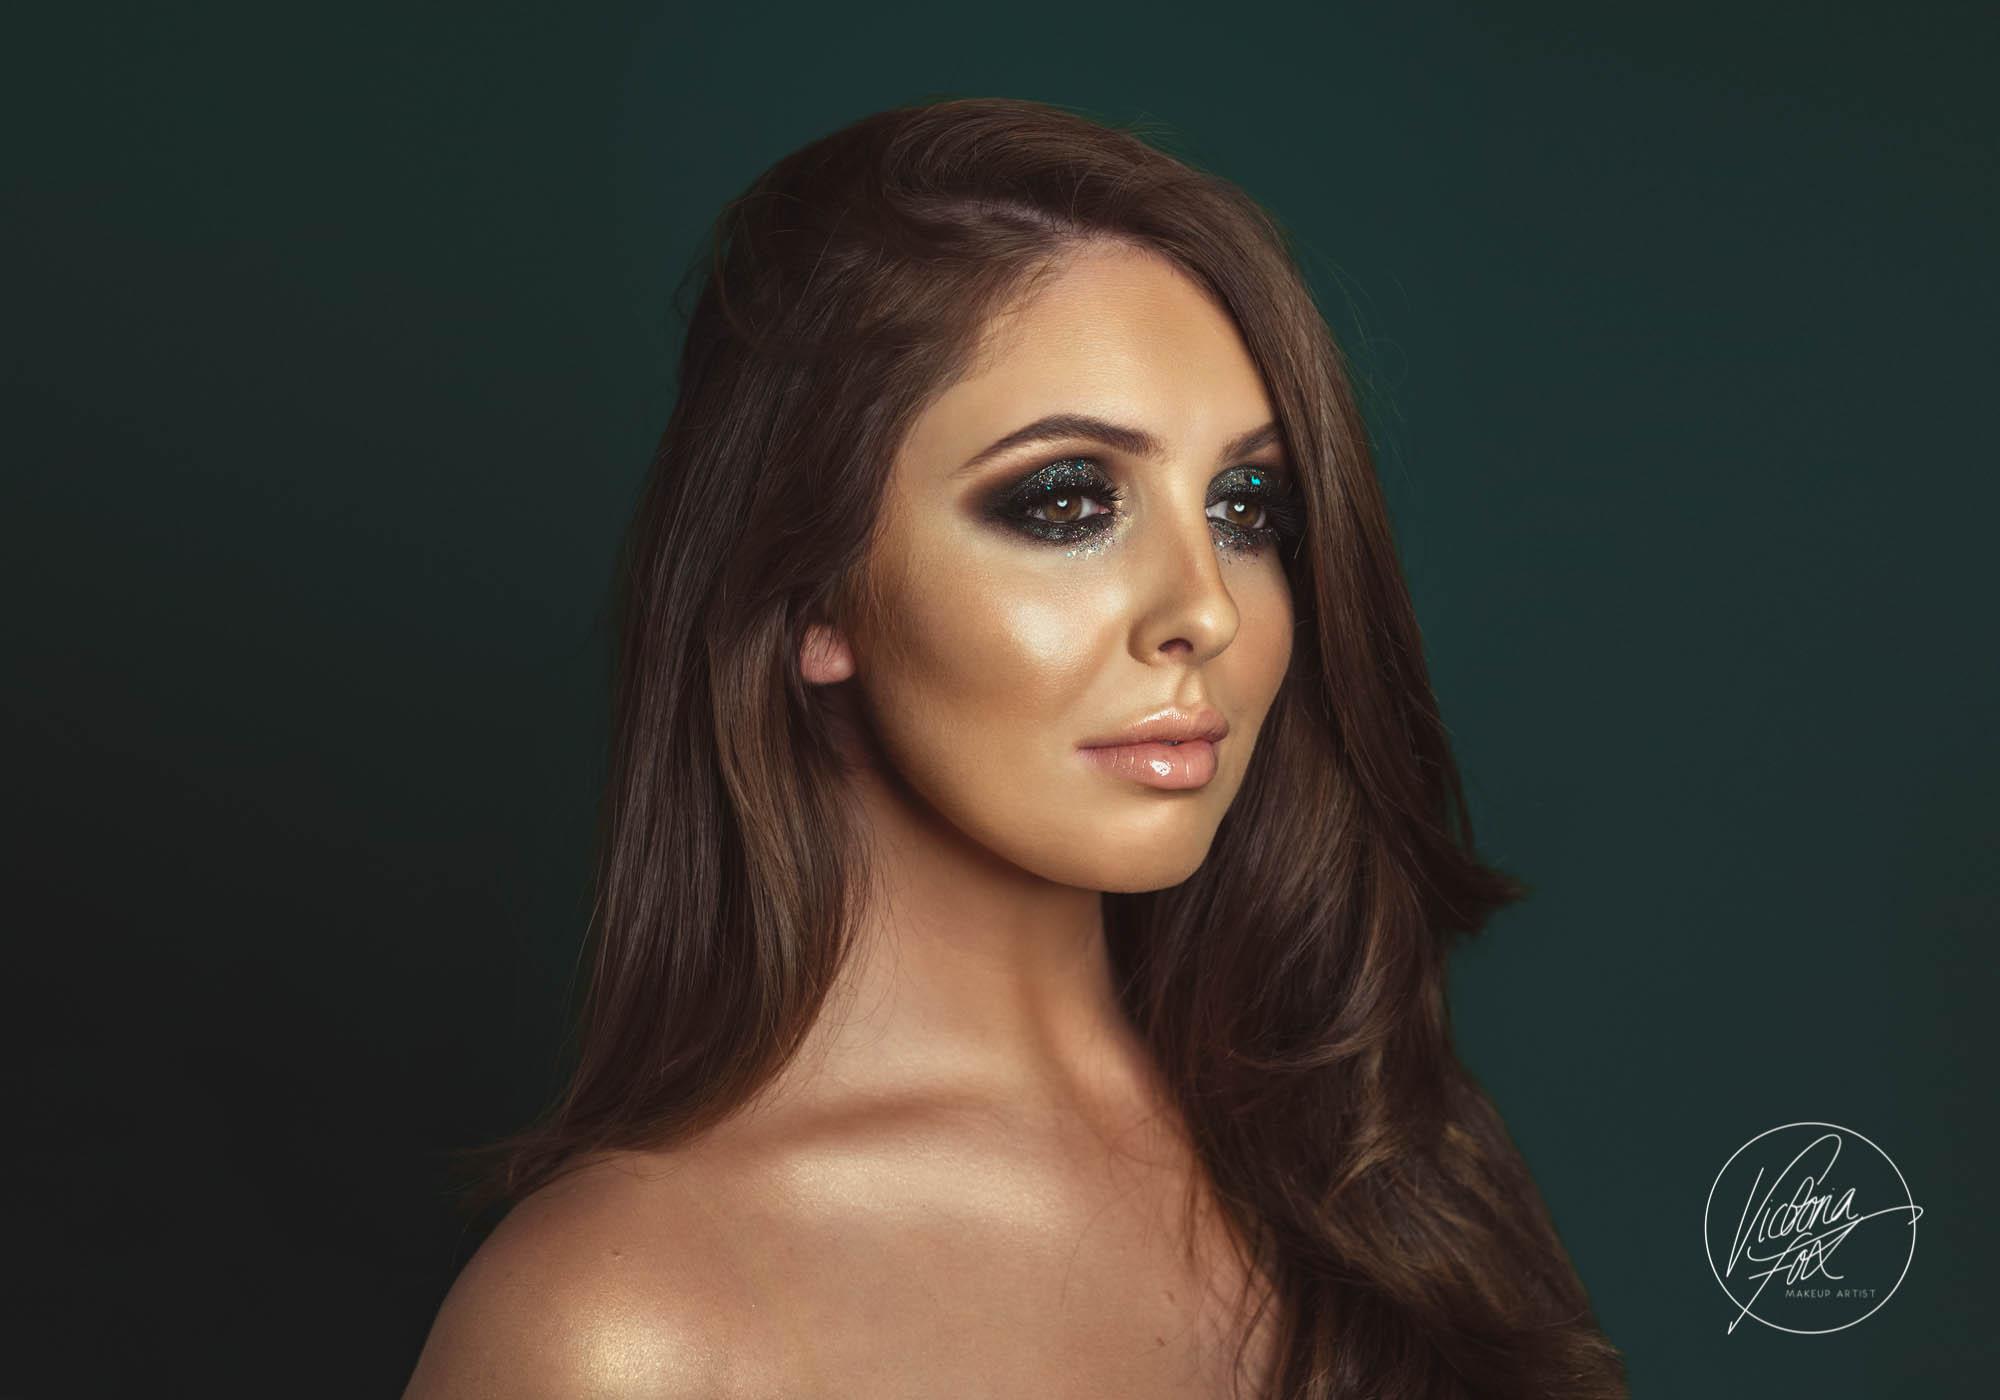 Victoria Fox - One to one makeup tutorials